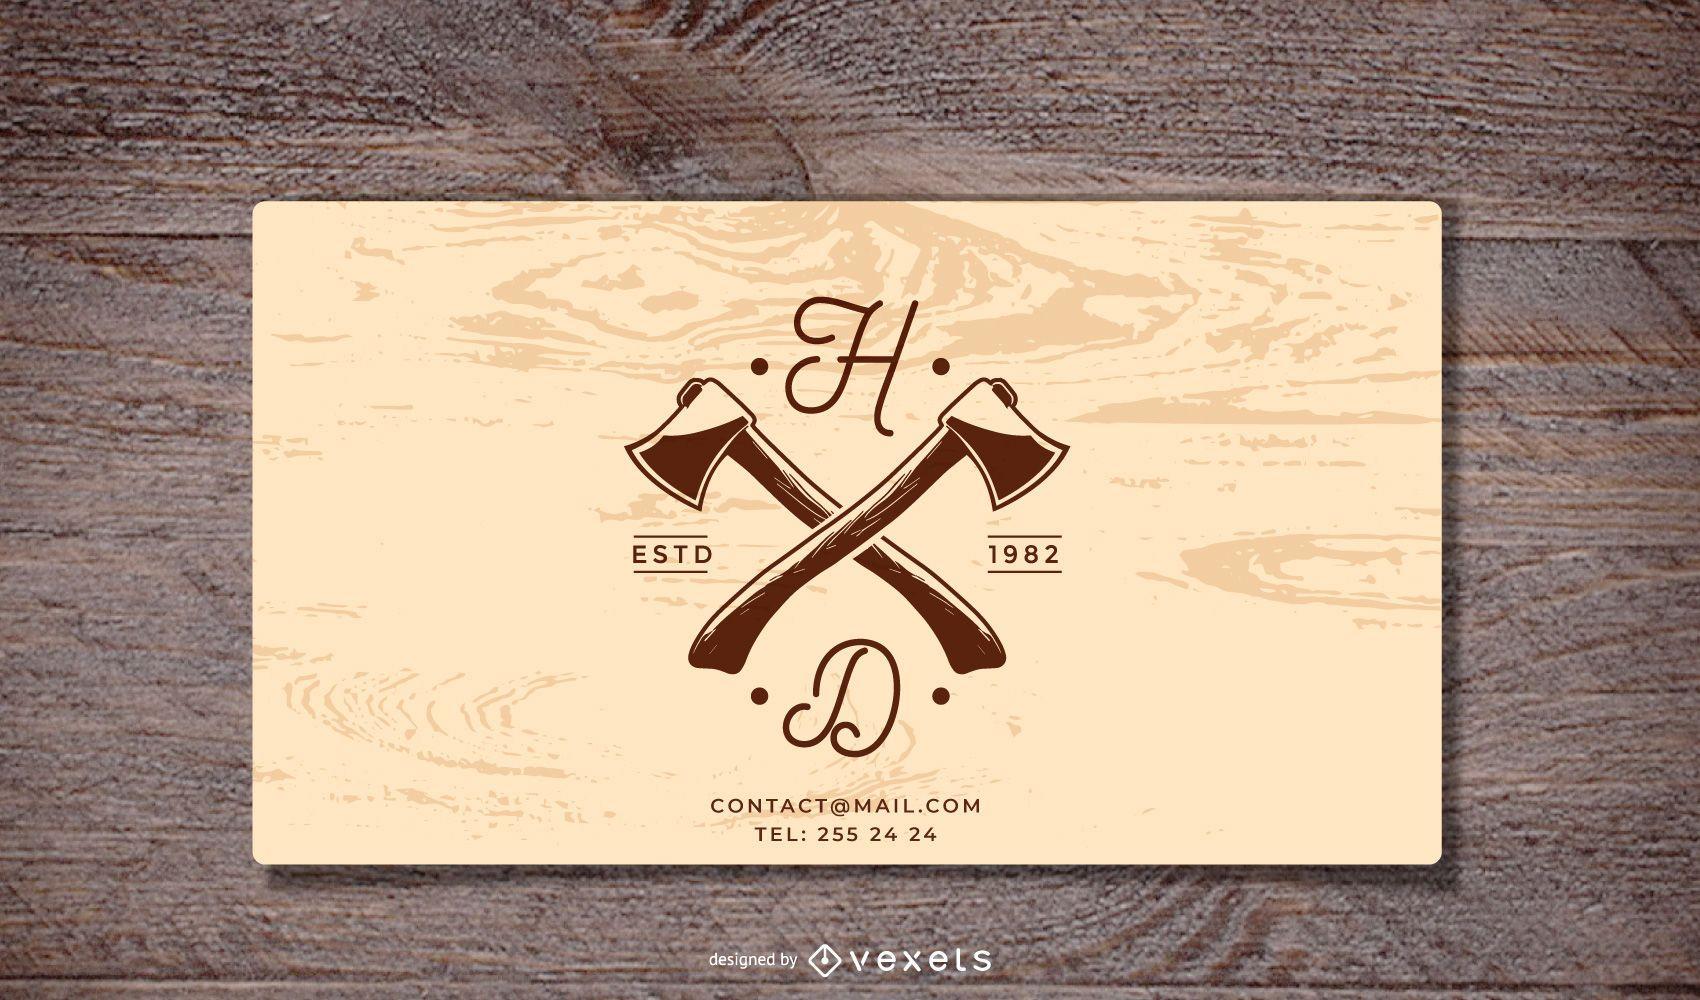 Plantilla de tarjeta de visita de fondo de madera